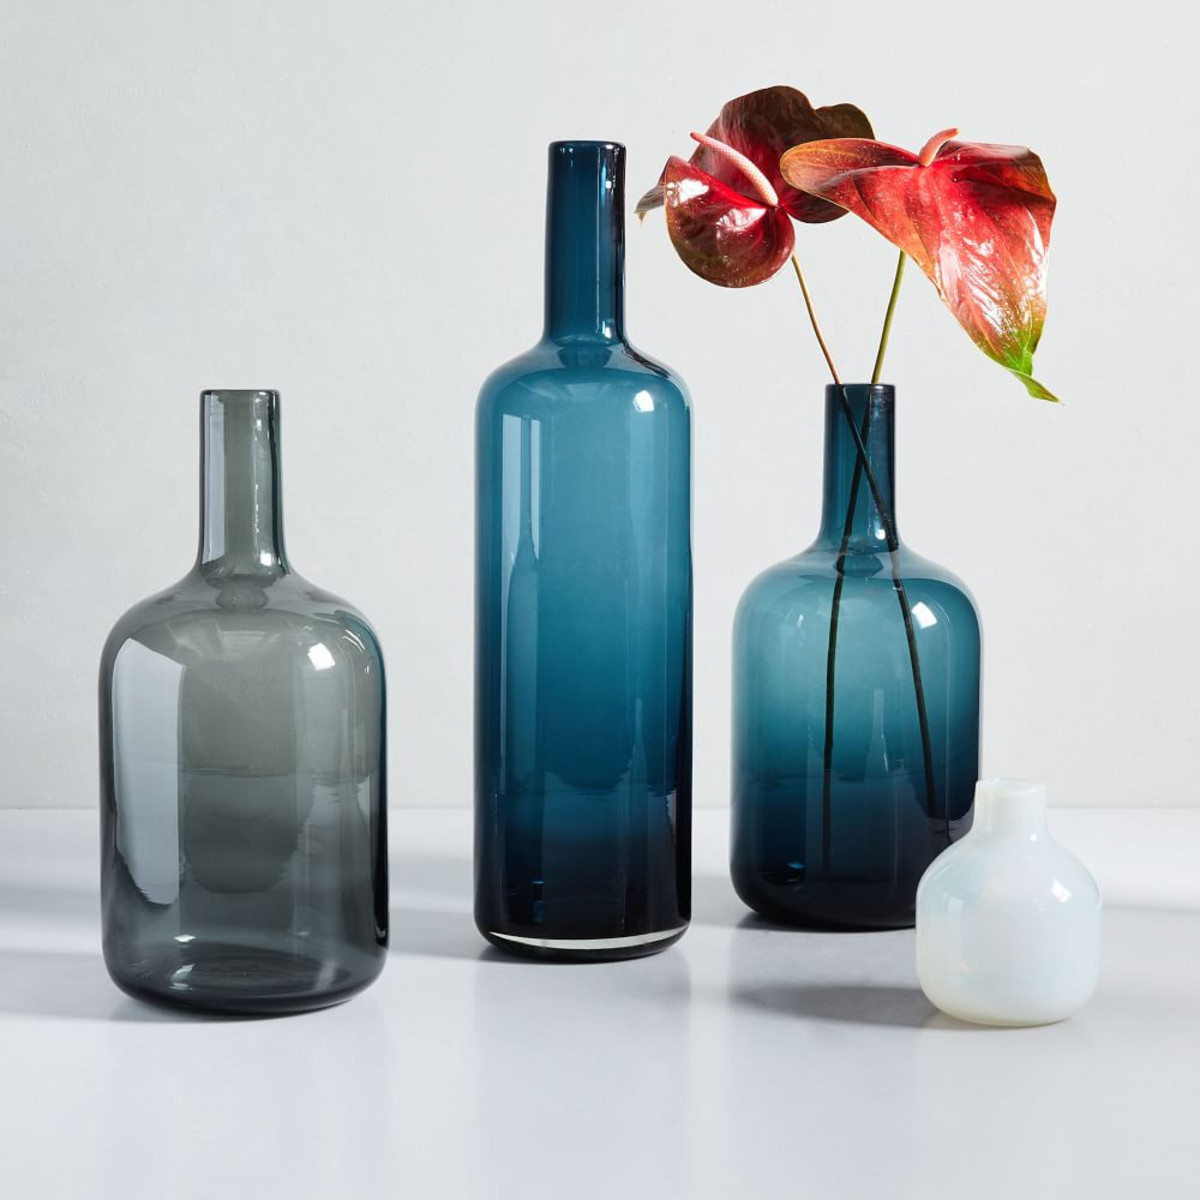 west elm bud vase of pure glass vases west elm australia intended for pure glass vases pure glass vases